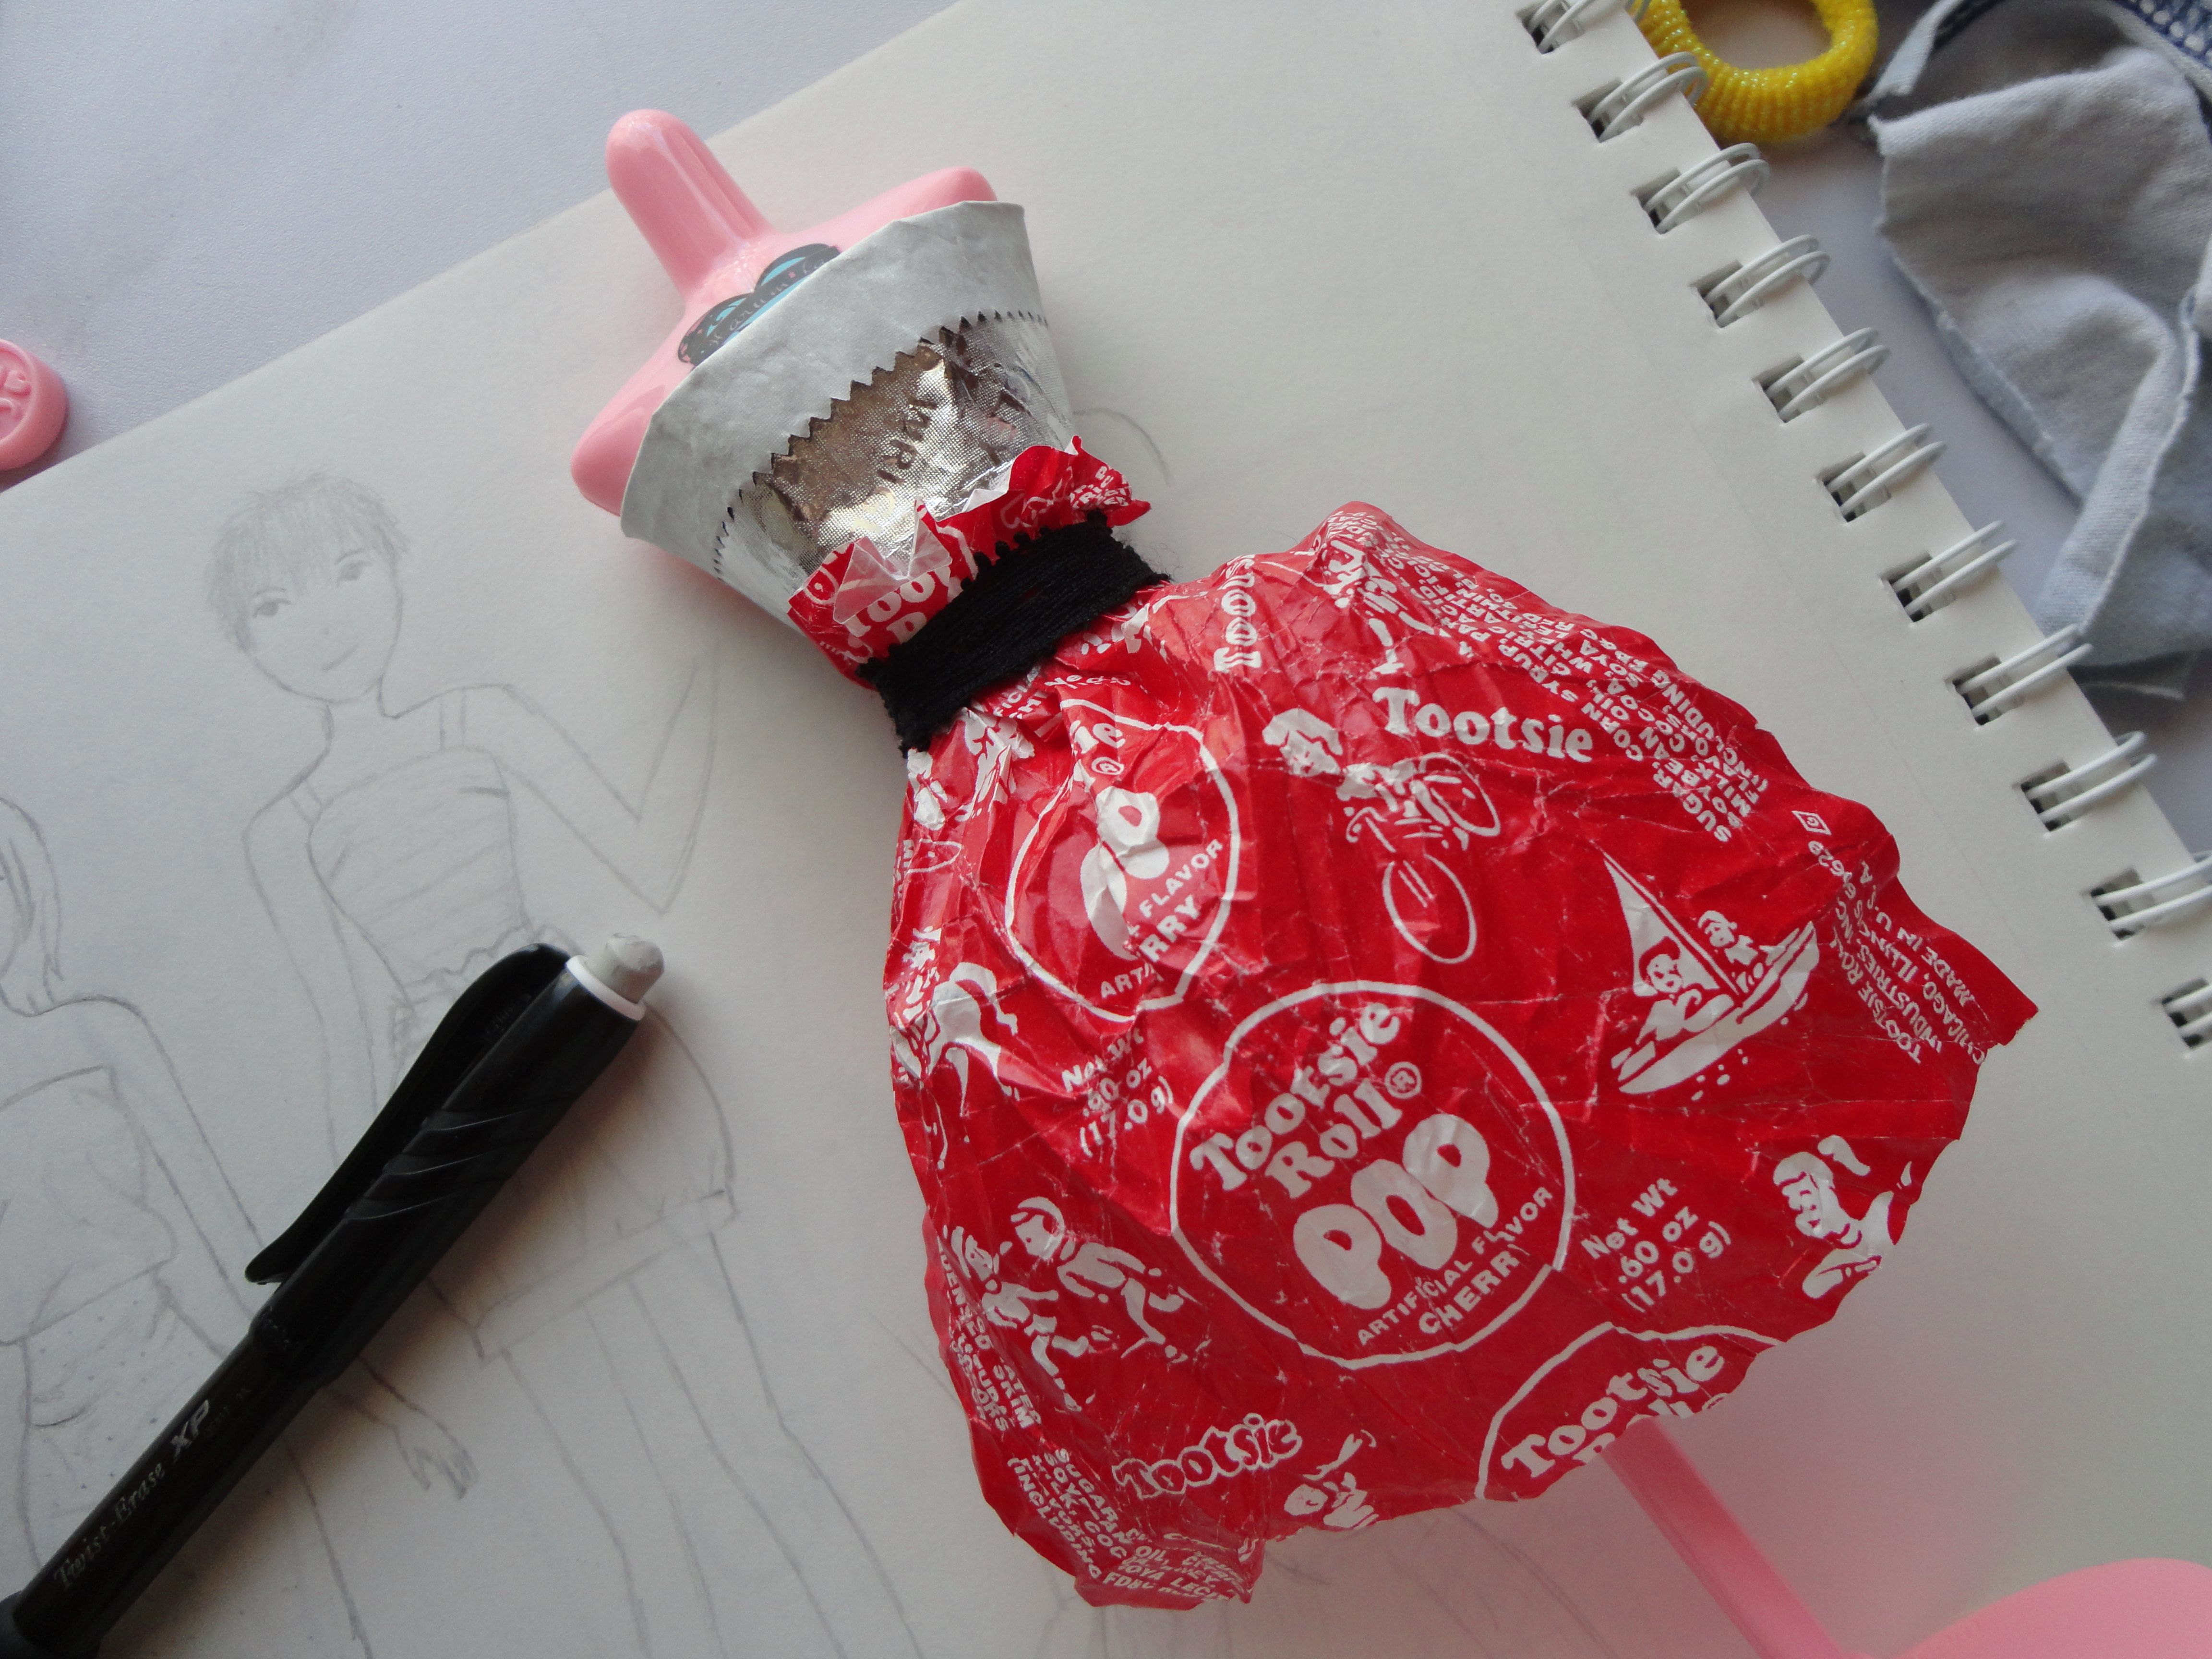 Original tootsie roll paper